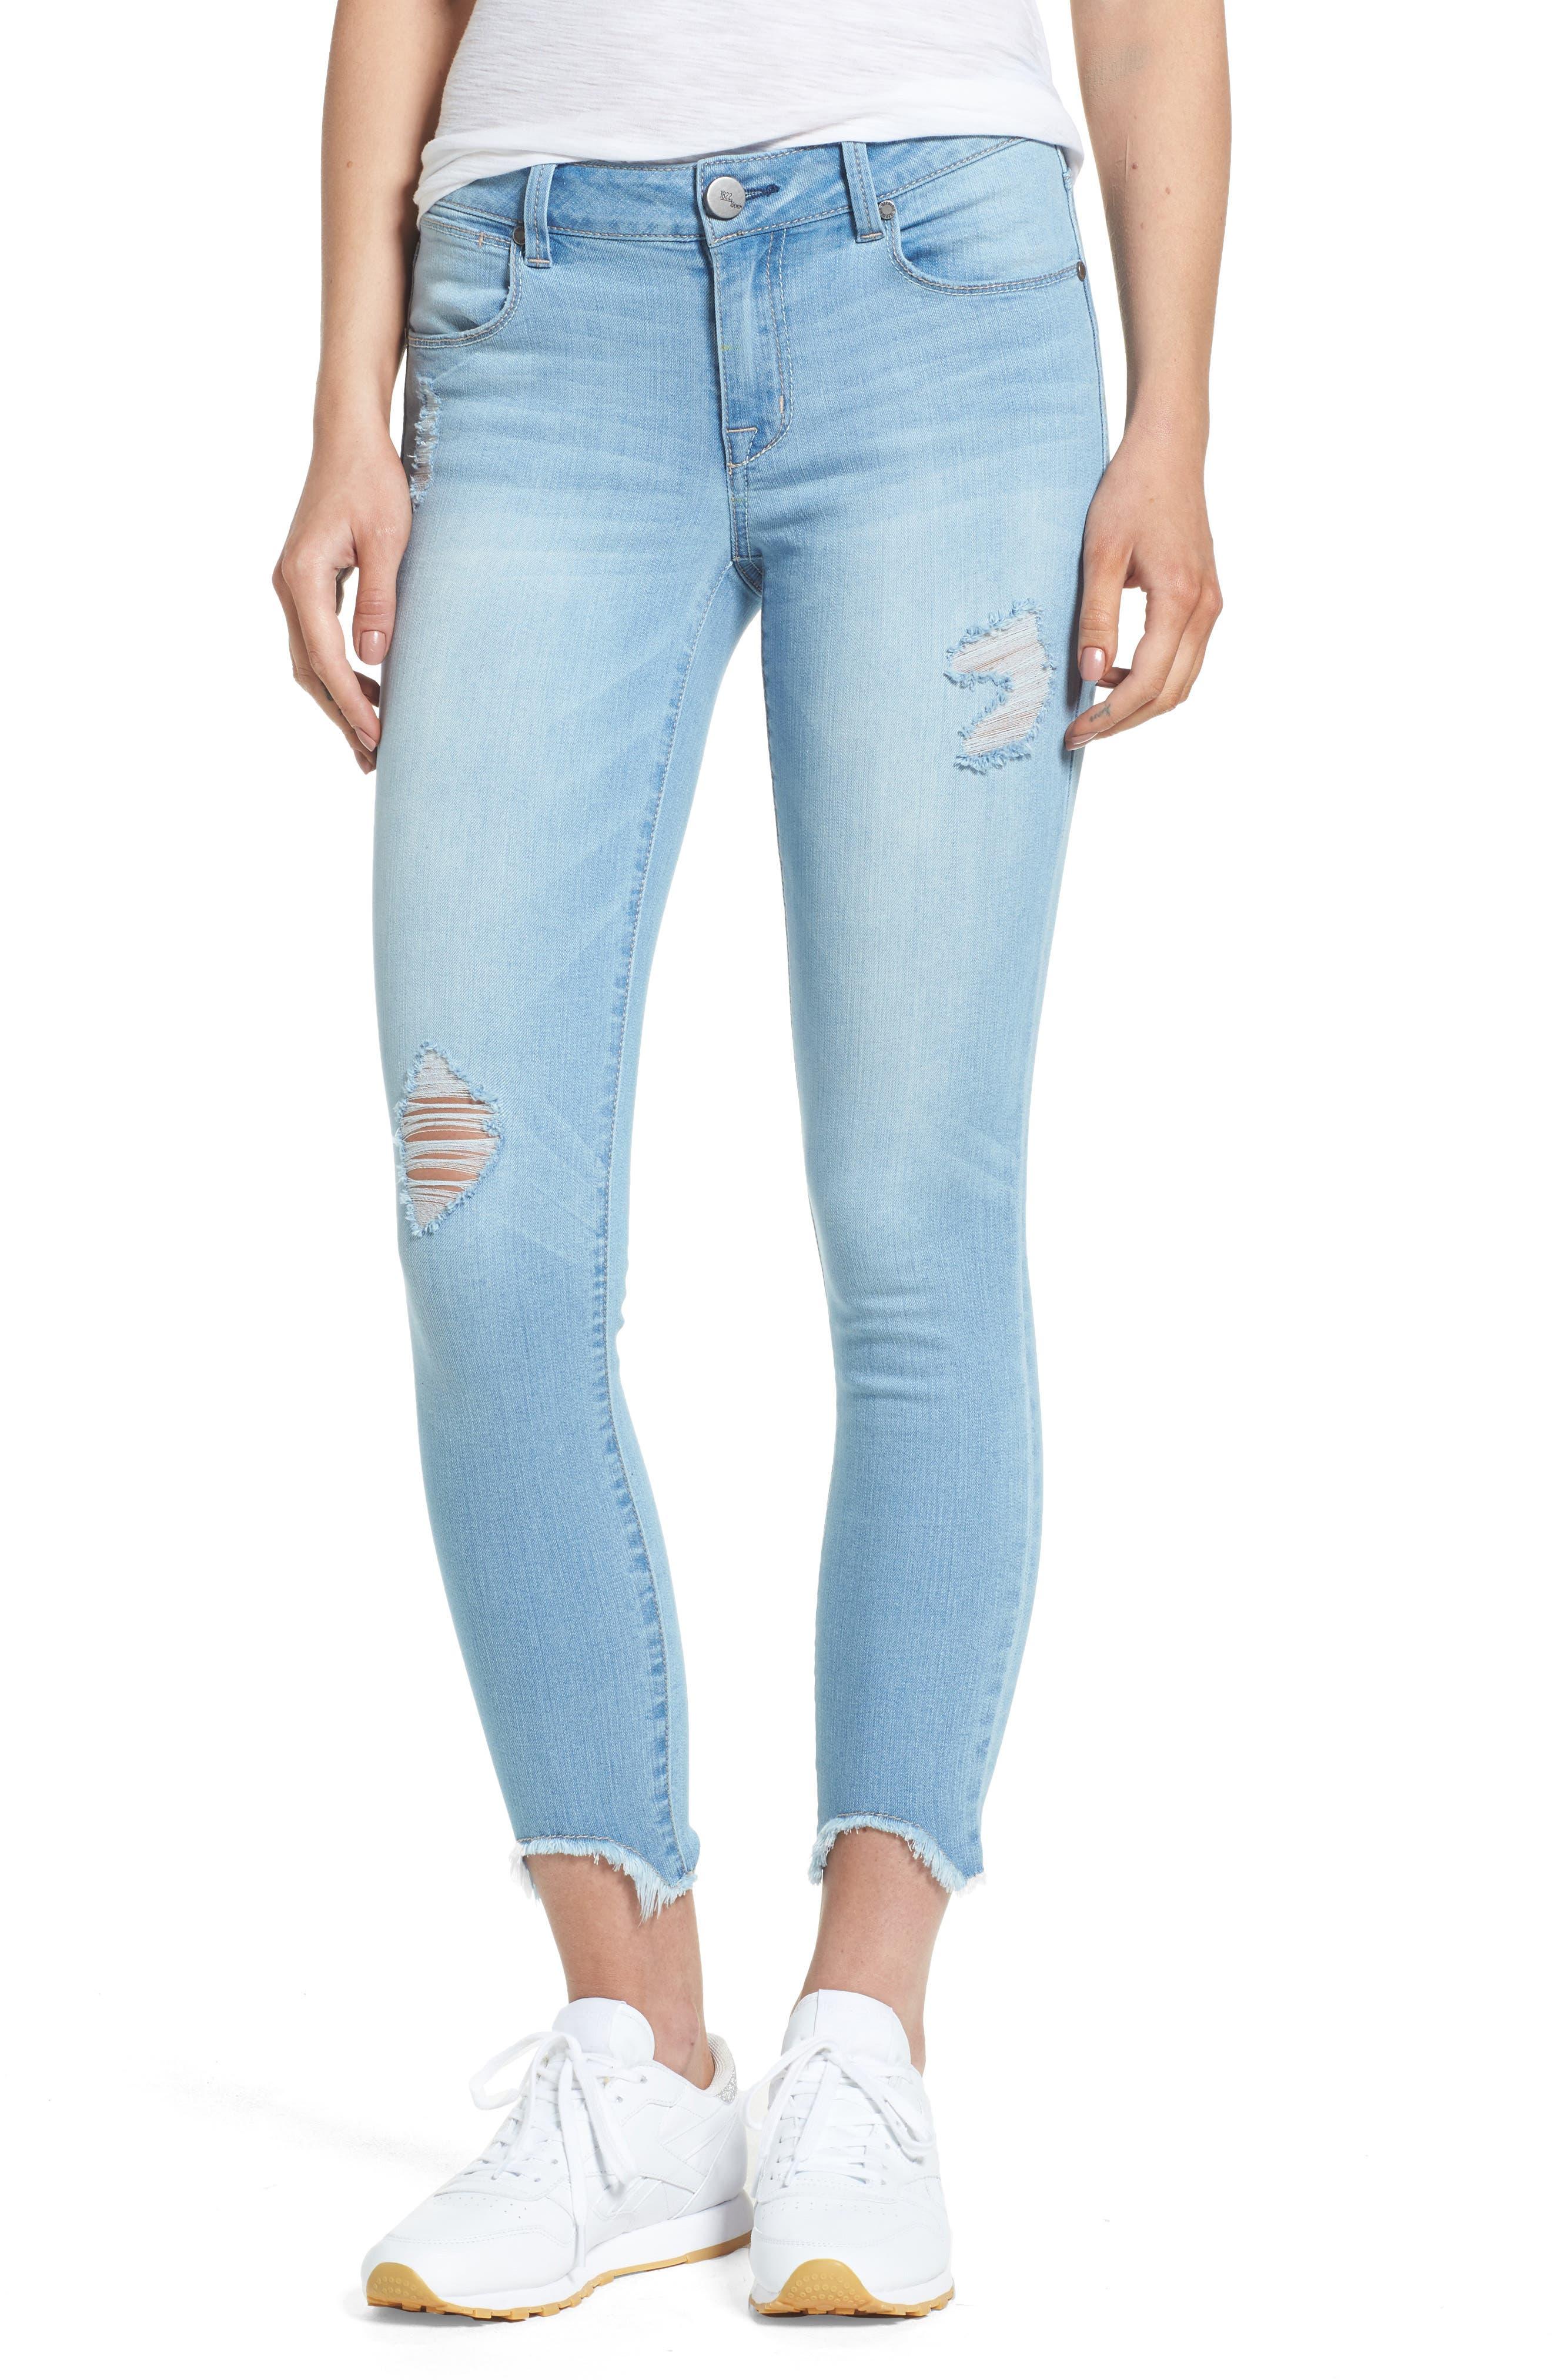 1822 Denim Raw Edge Skinny Jeans (Nirvana)